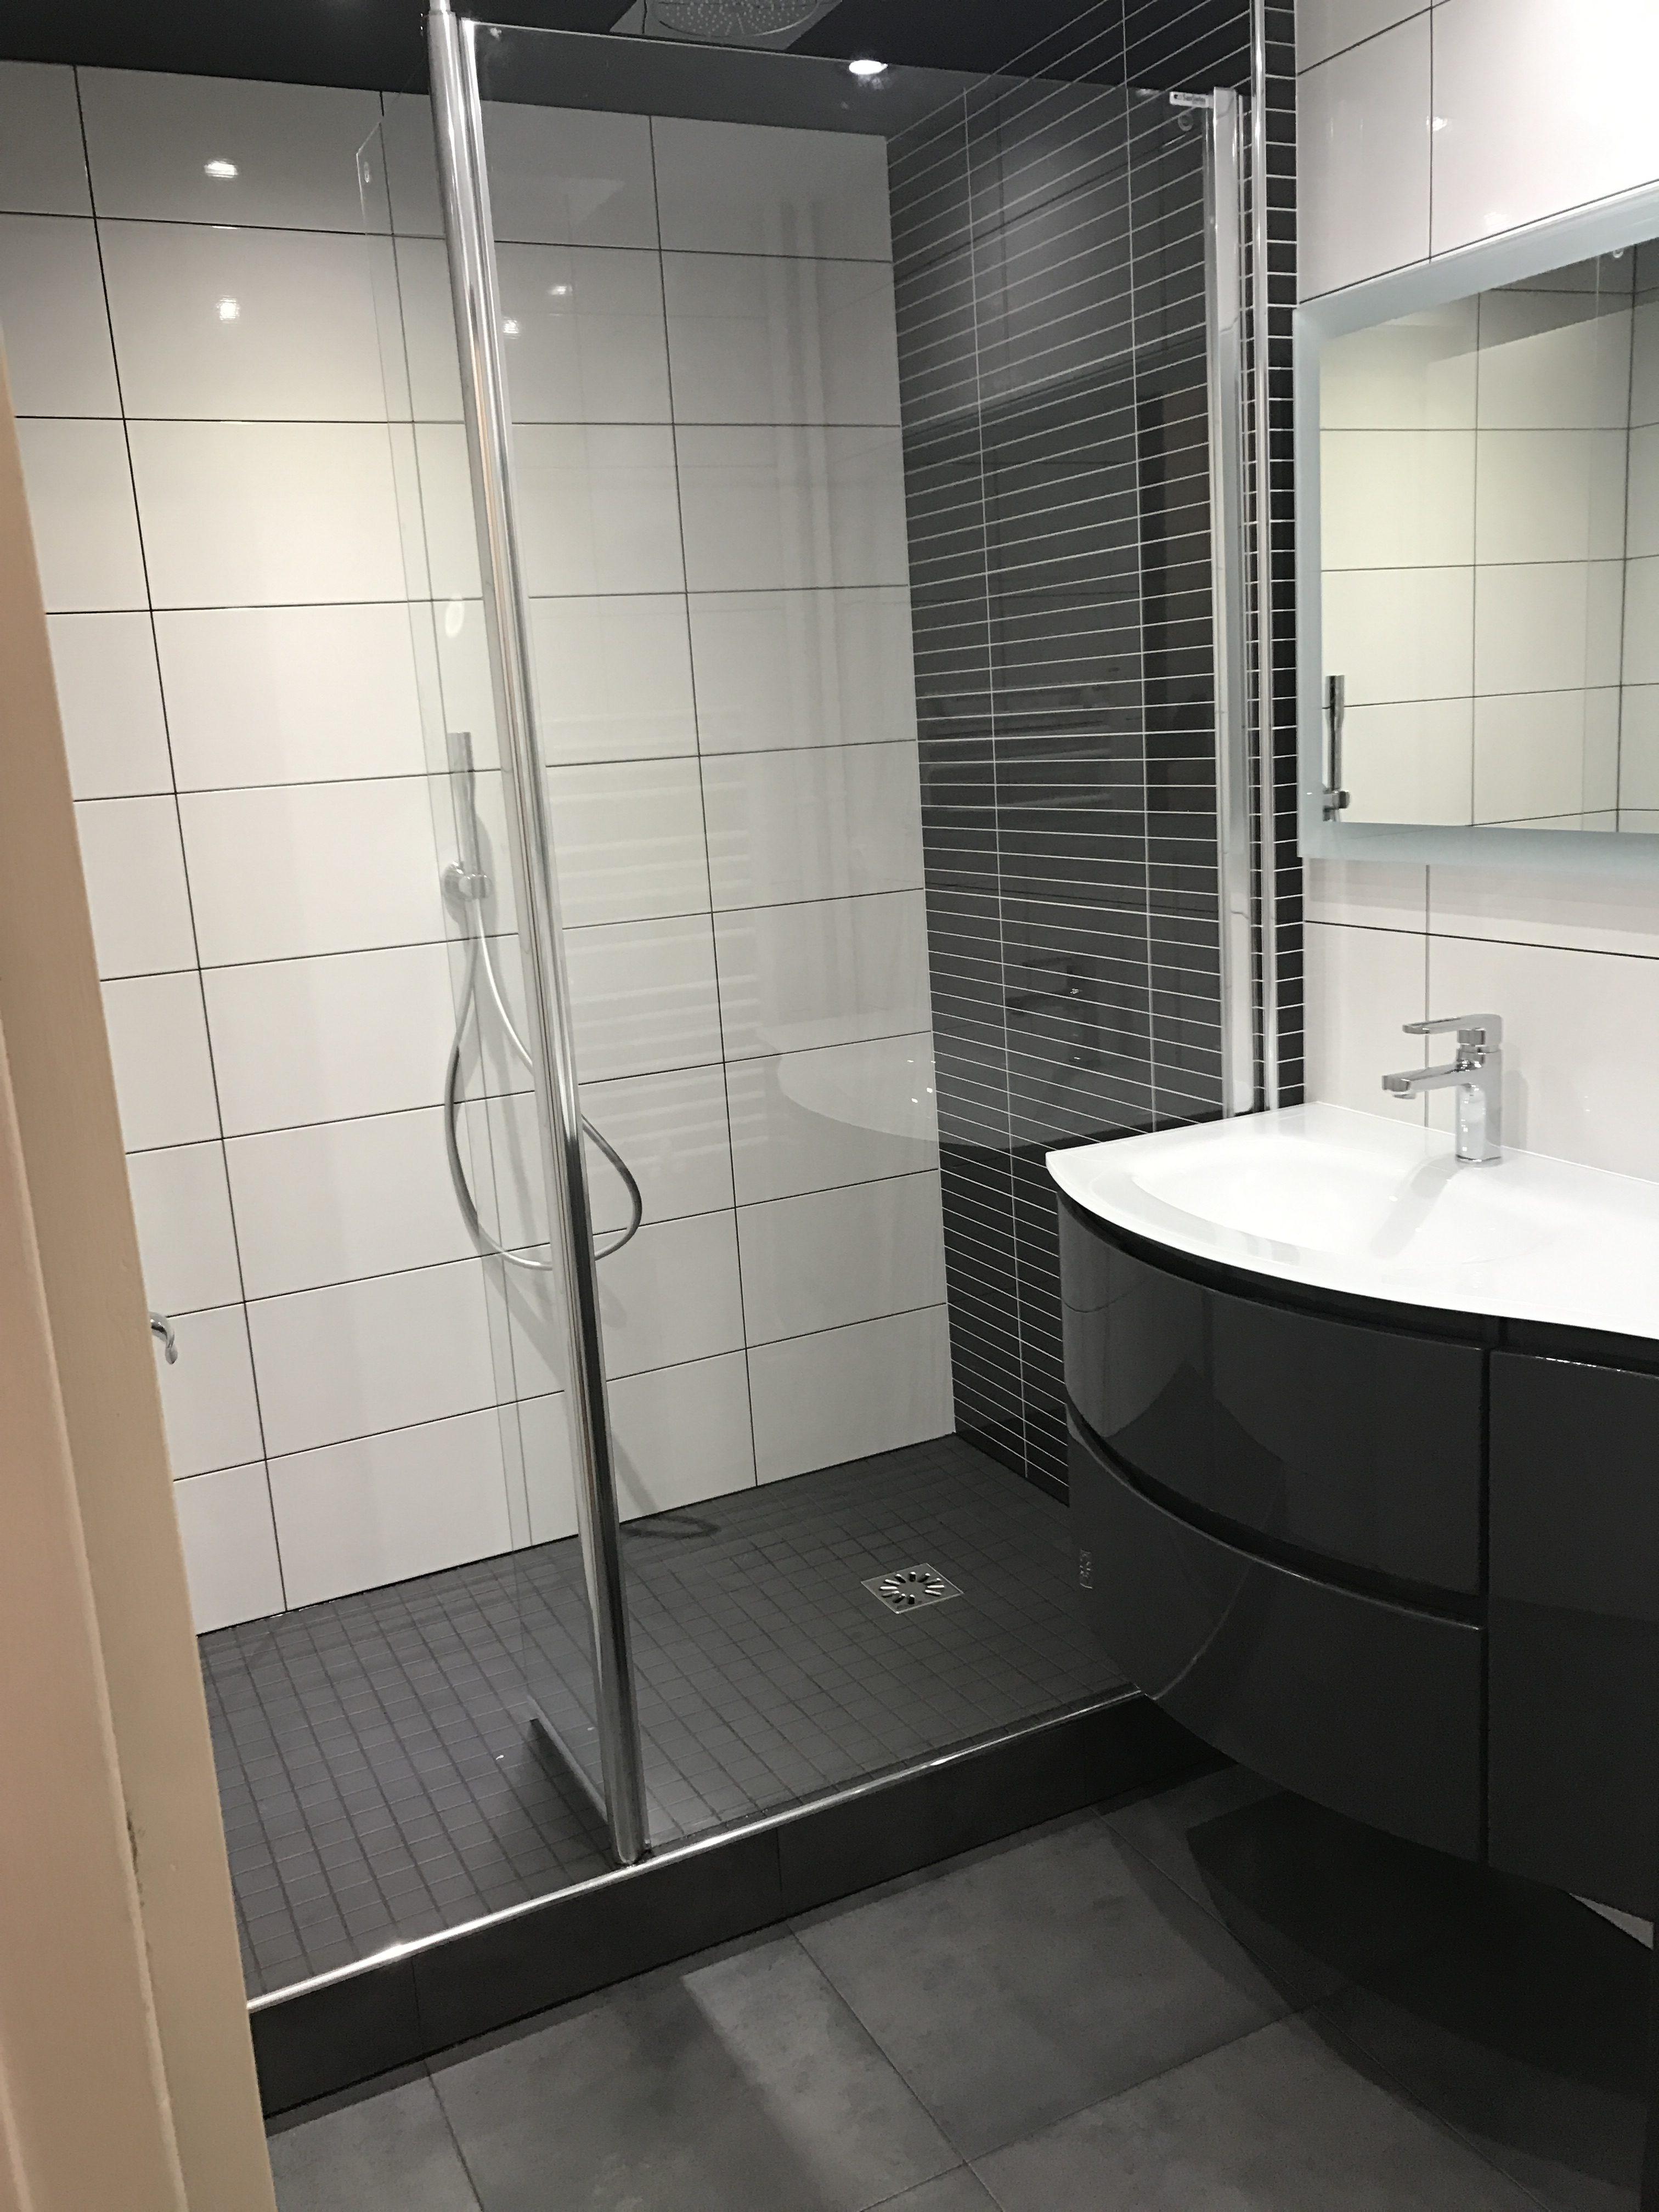 realisation-salle-de-bain-lcrdp-renovation-orleans-11